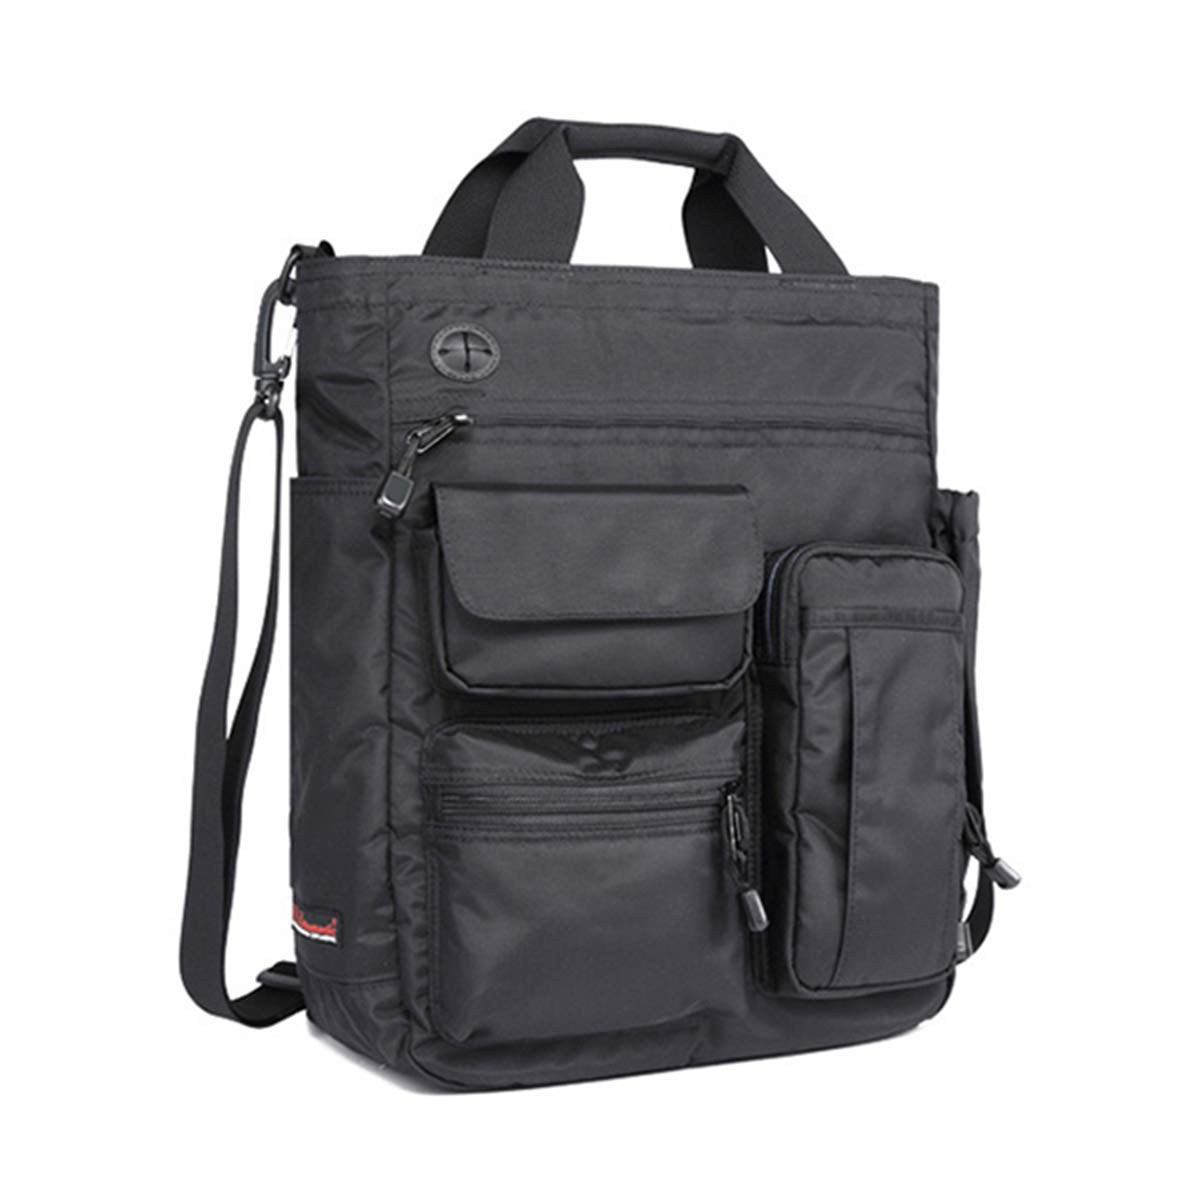 JOSEKO Multifunction Mens Military Tactical Shoulder Bag, Nylon Laptop Messenger Bag fit for 13'' IPad Black 7.87''x 1.15''x 5.91''(L x W x H)